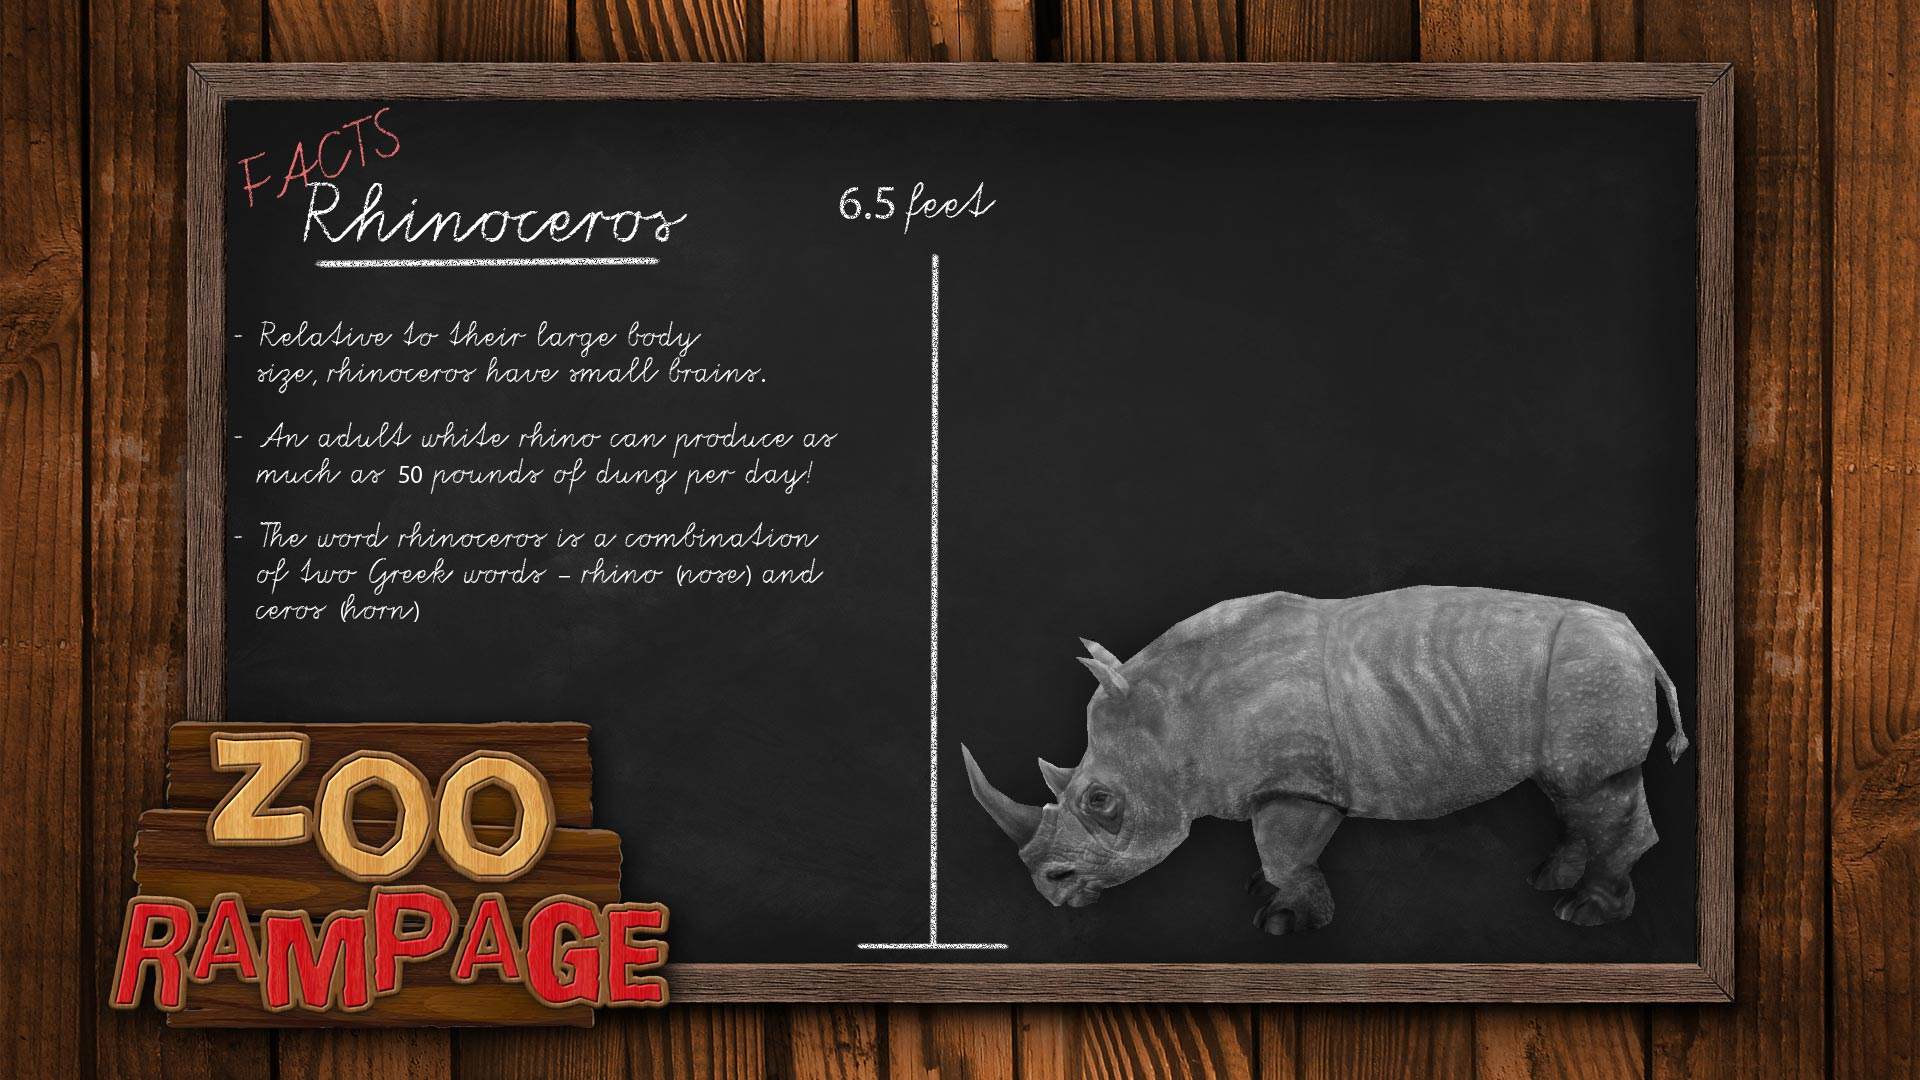 Zoo Rampage - Rhinoceros   Steam Trading Cards Wiki   FANDOM